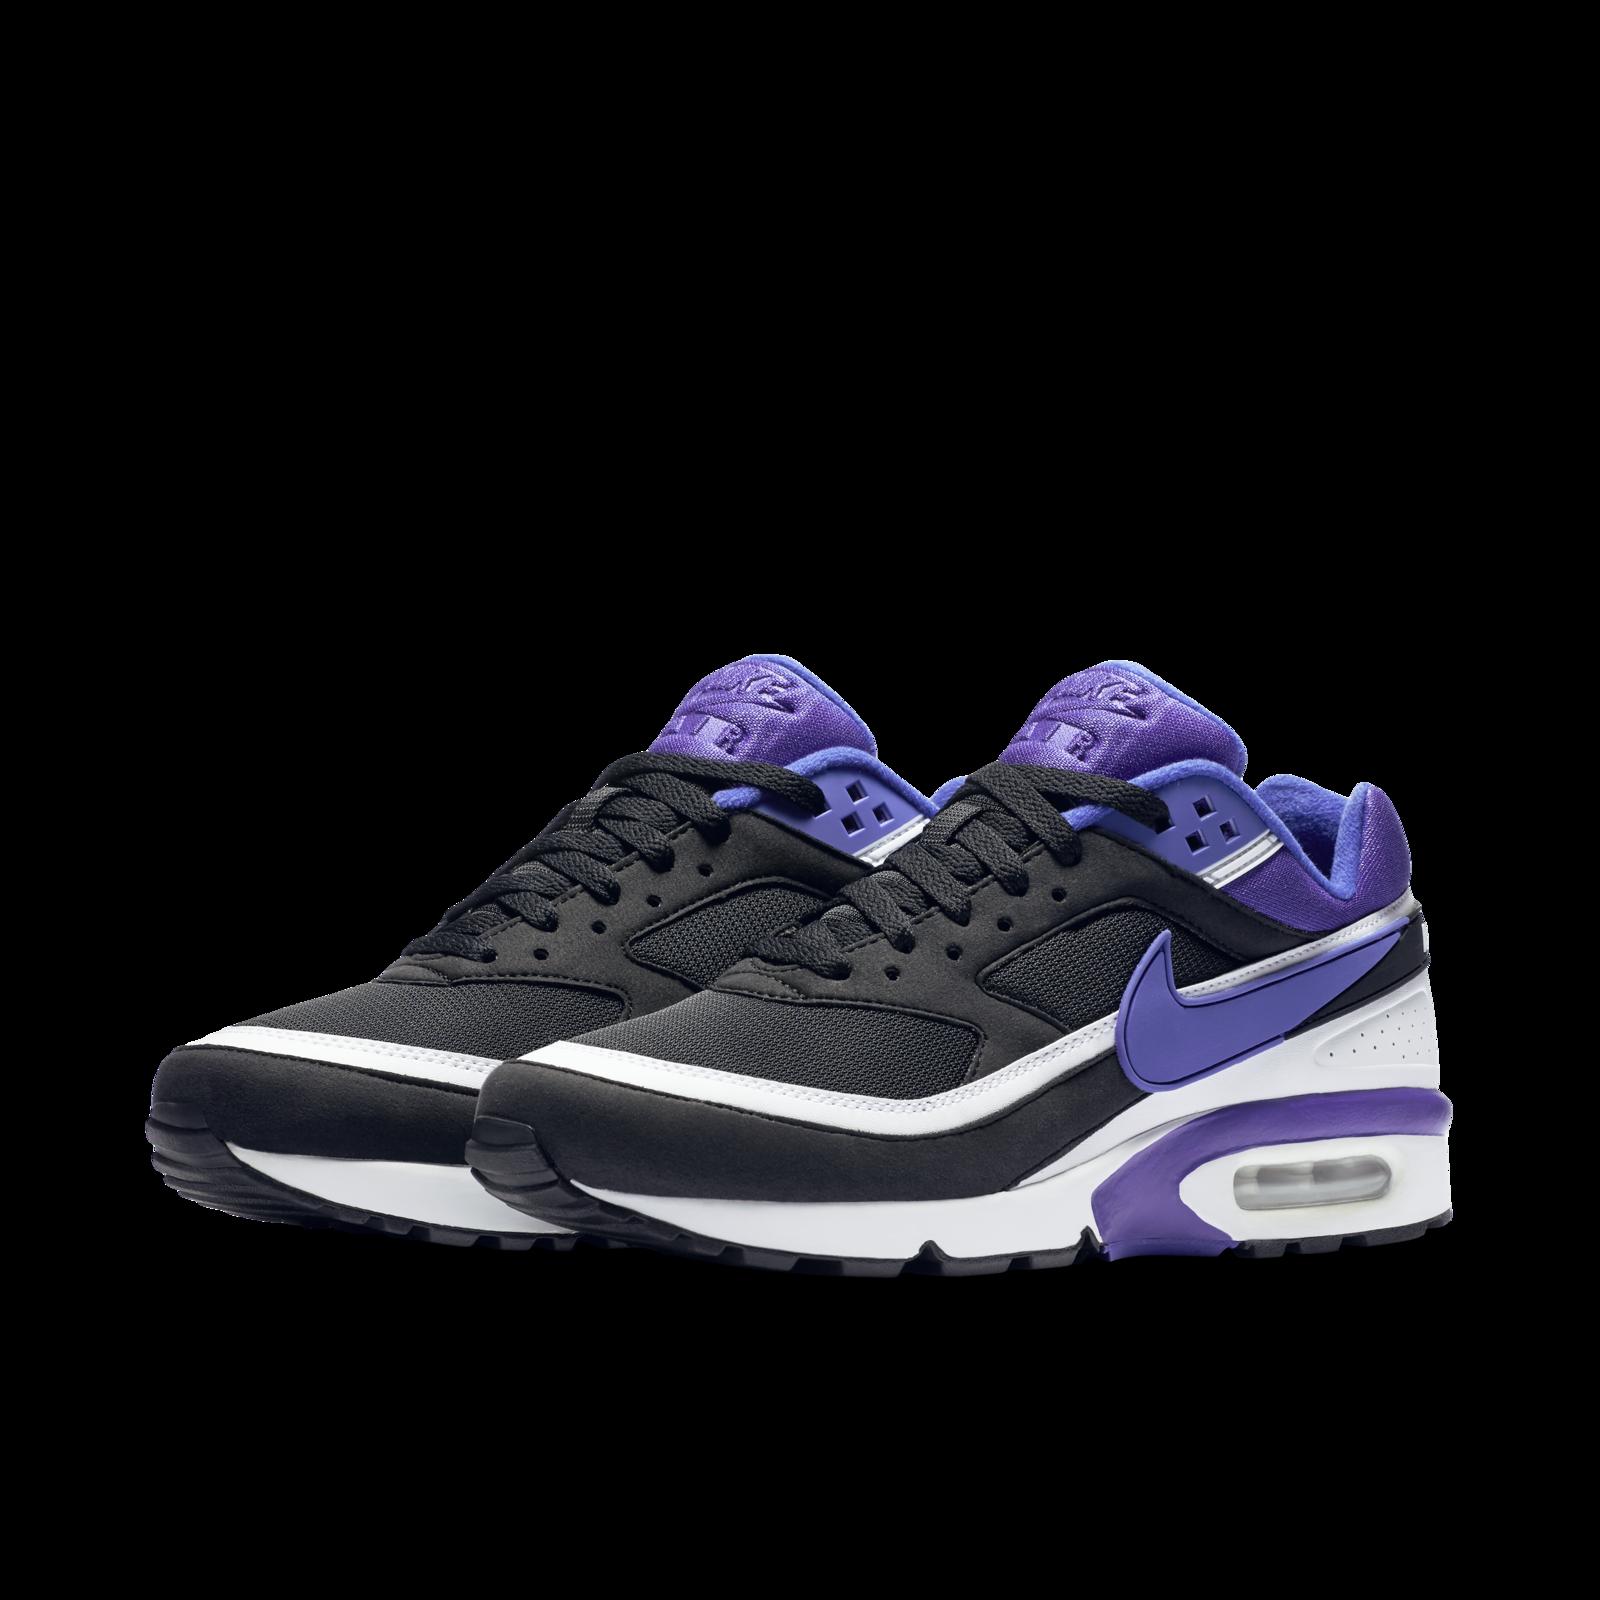 nike air max bw nero purple